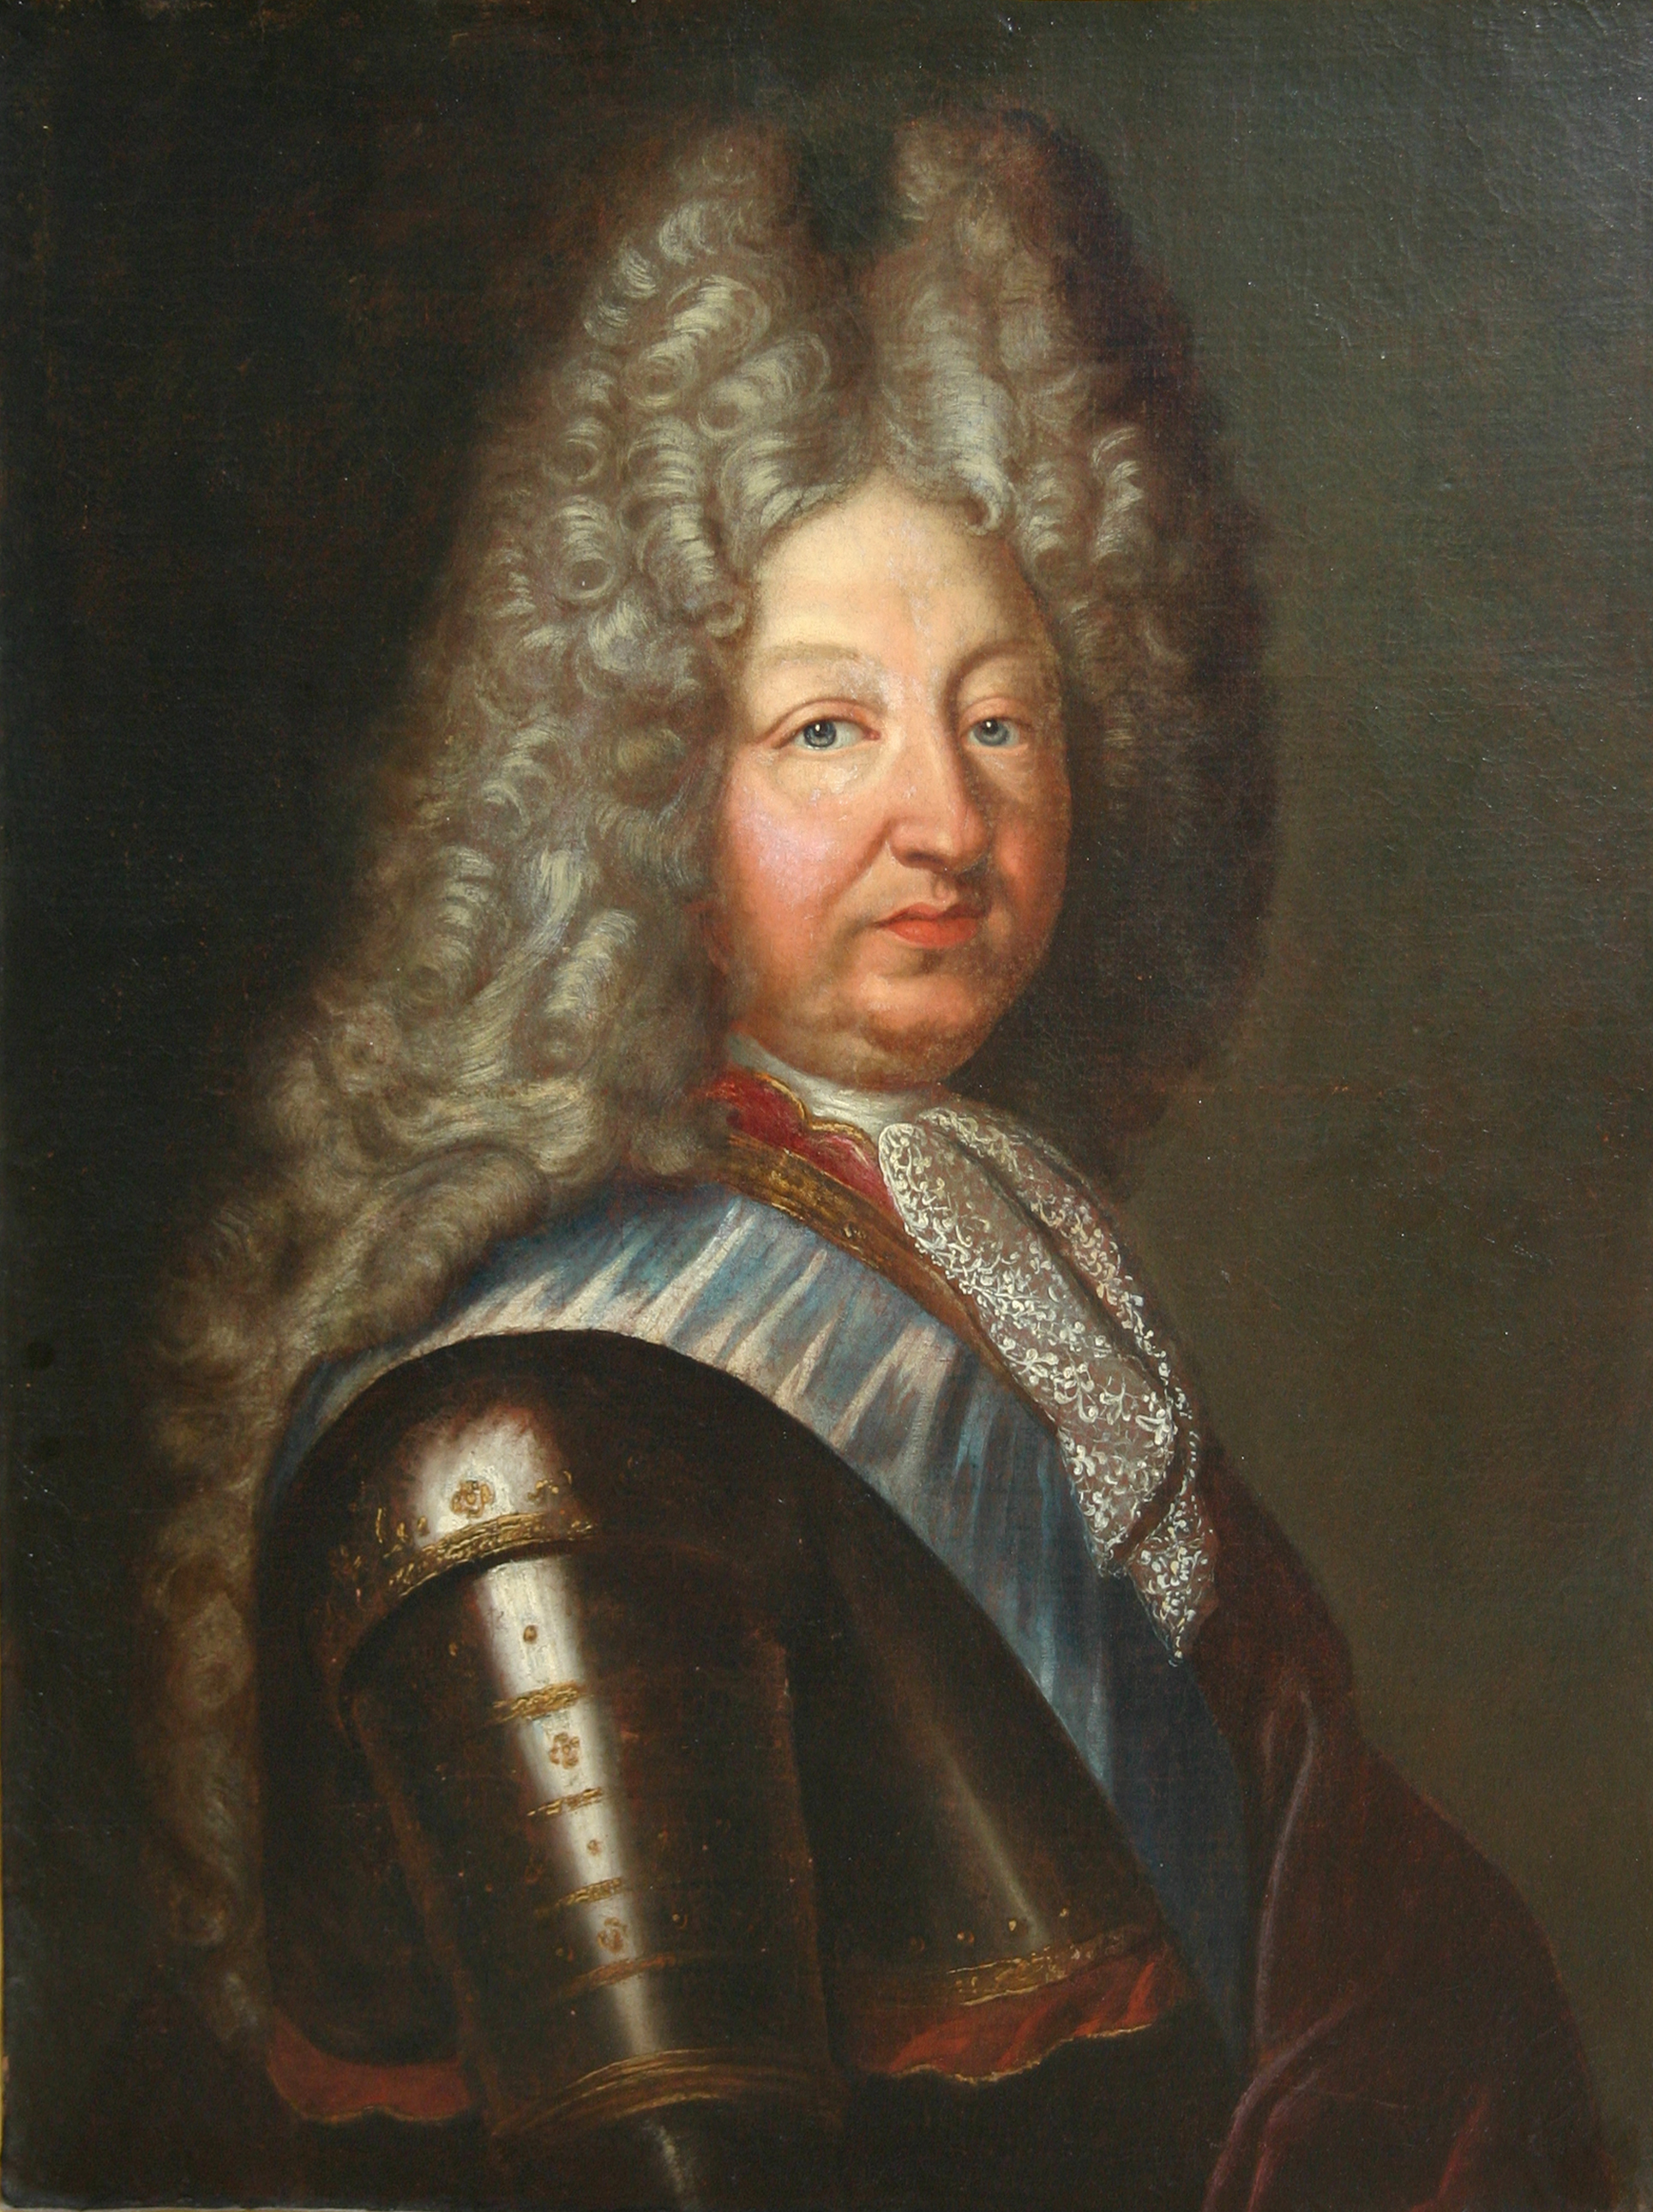 Portrait of Louis XIV, artist unknown, late 1600s, oil on canvas, 99 x 88 cm